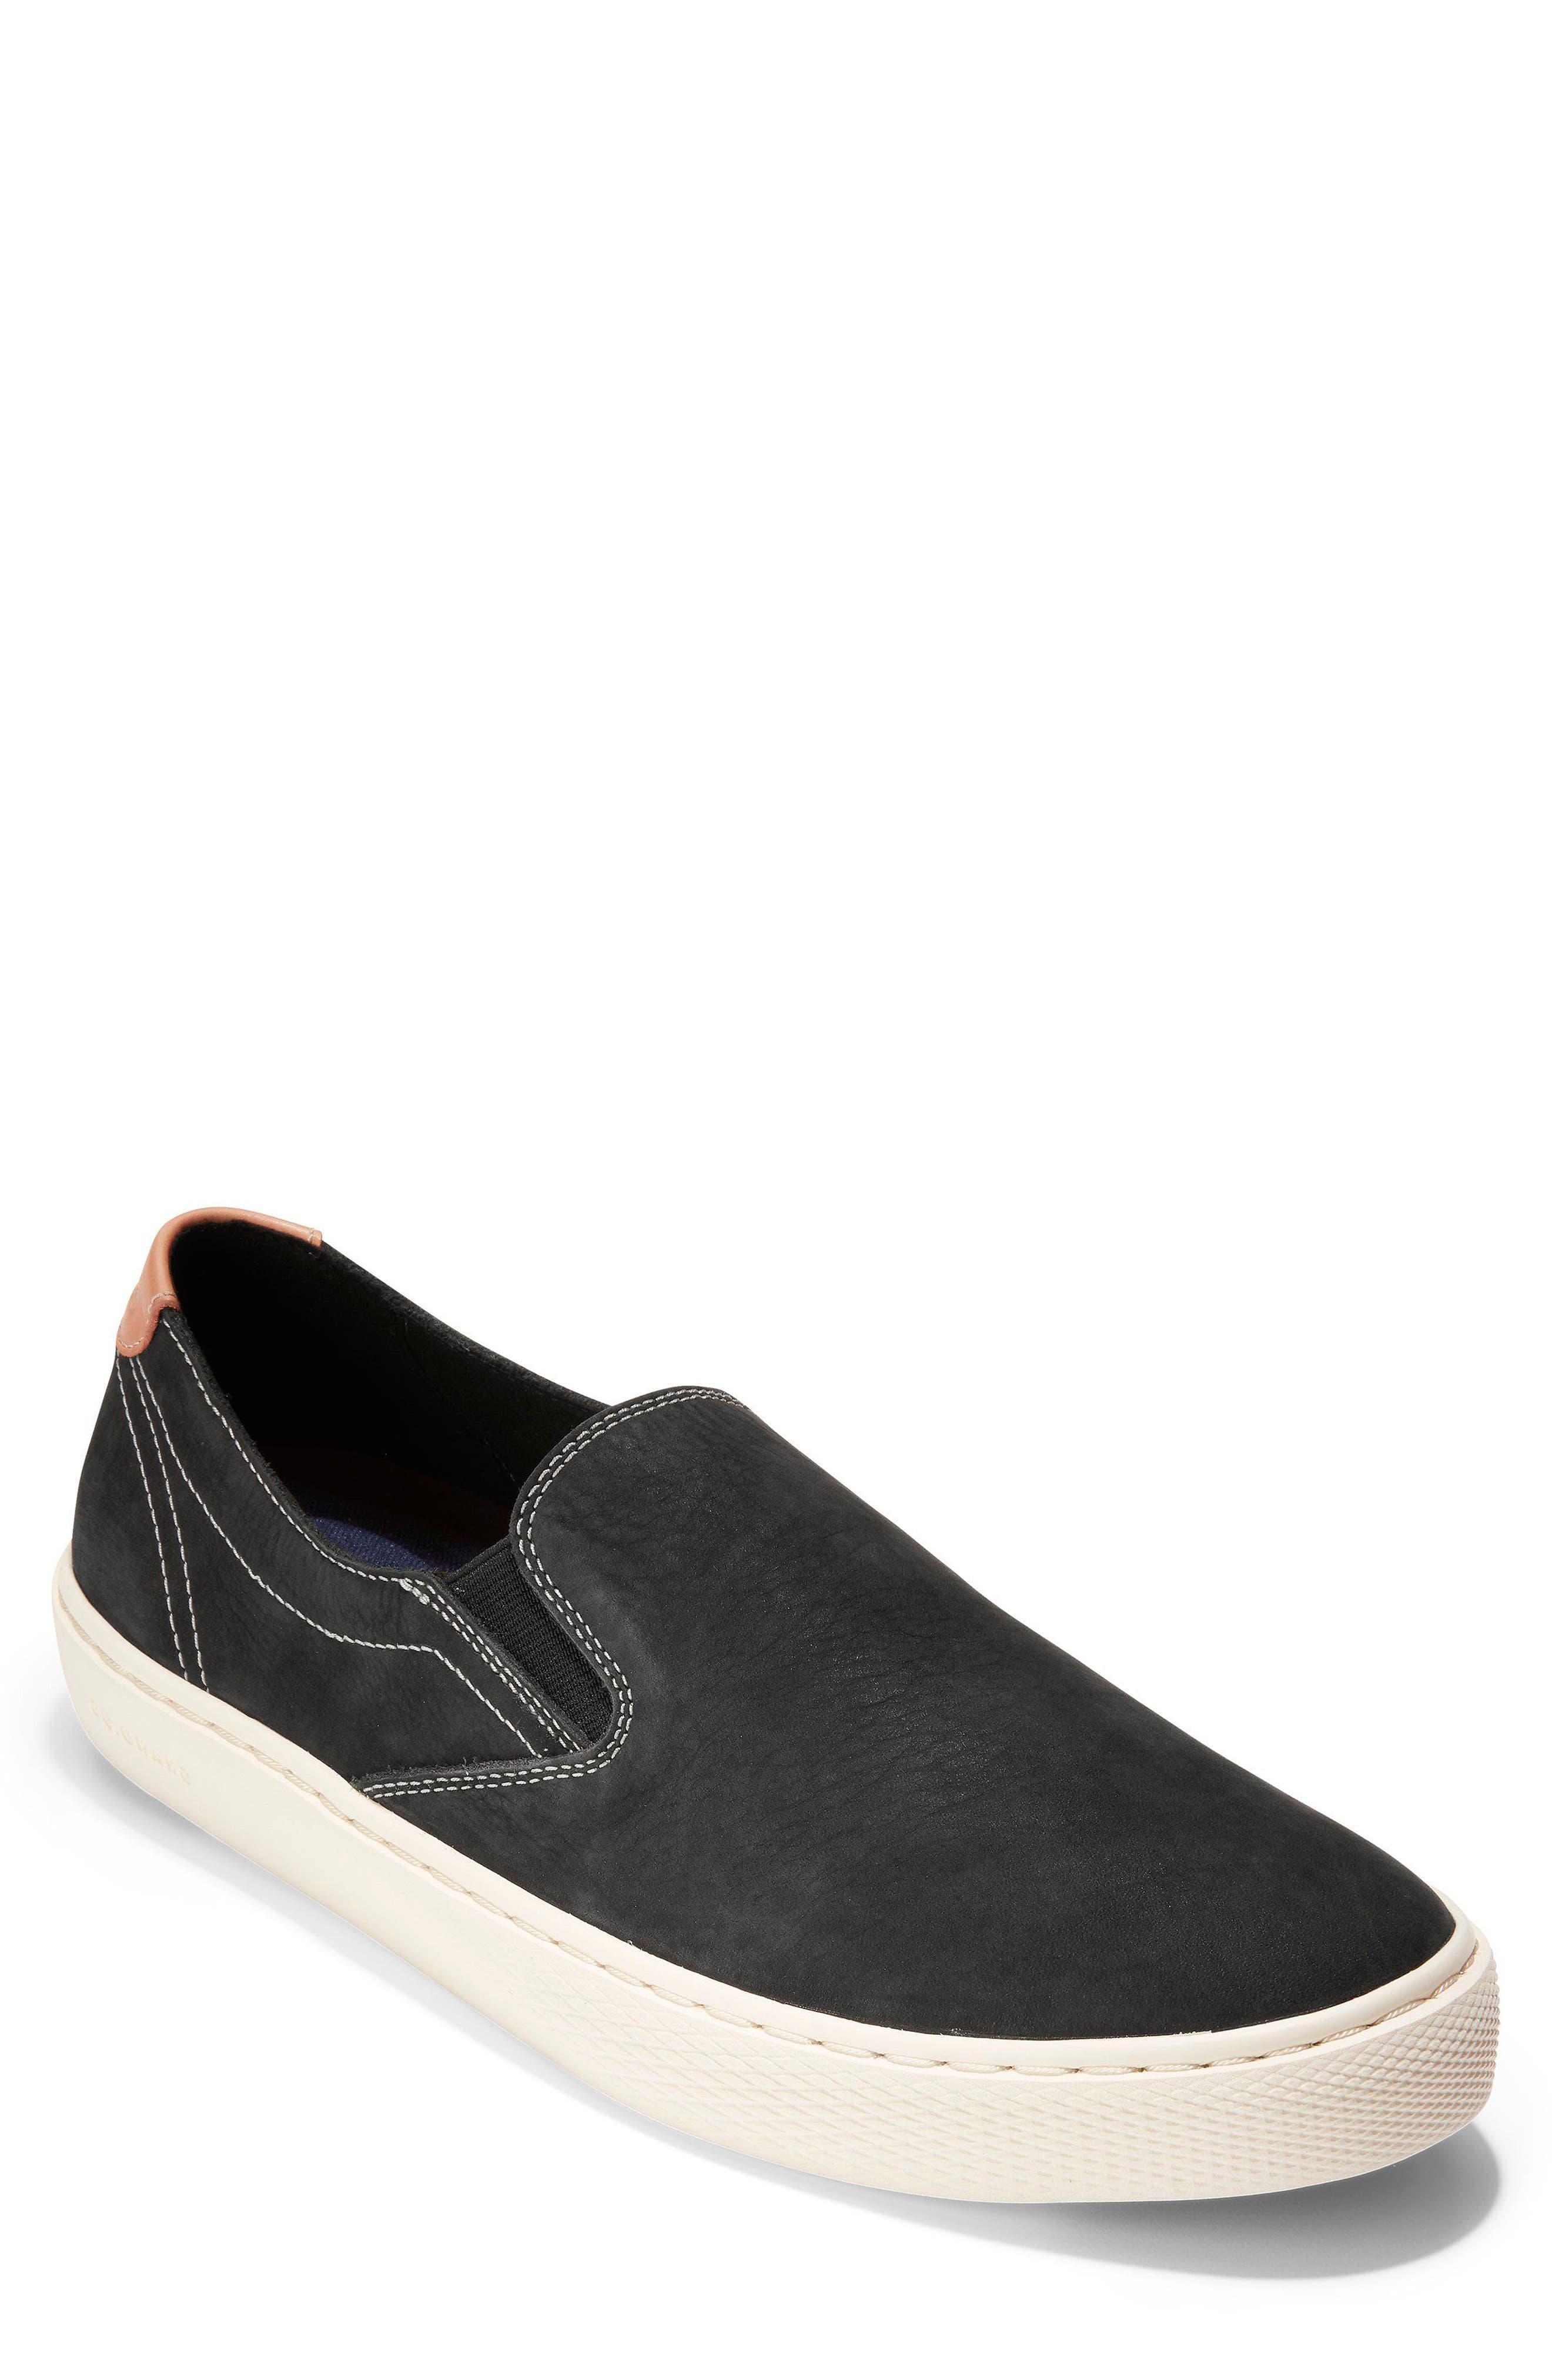 GrandPrø Deck Slip-On Sneaker,                             Main thumbnail 1, color,                             BLACK NUBUCK